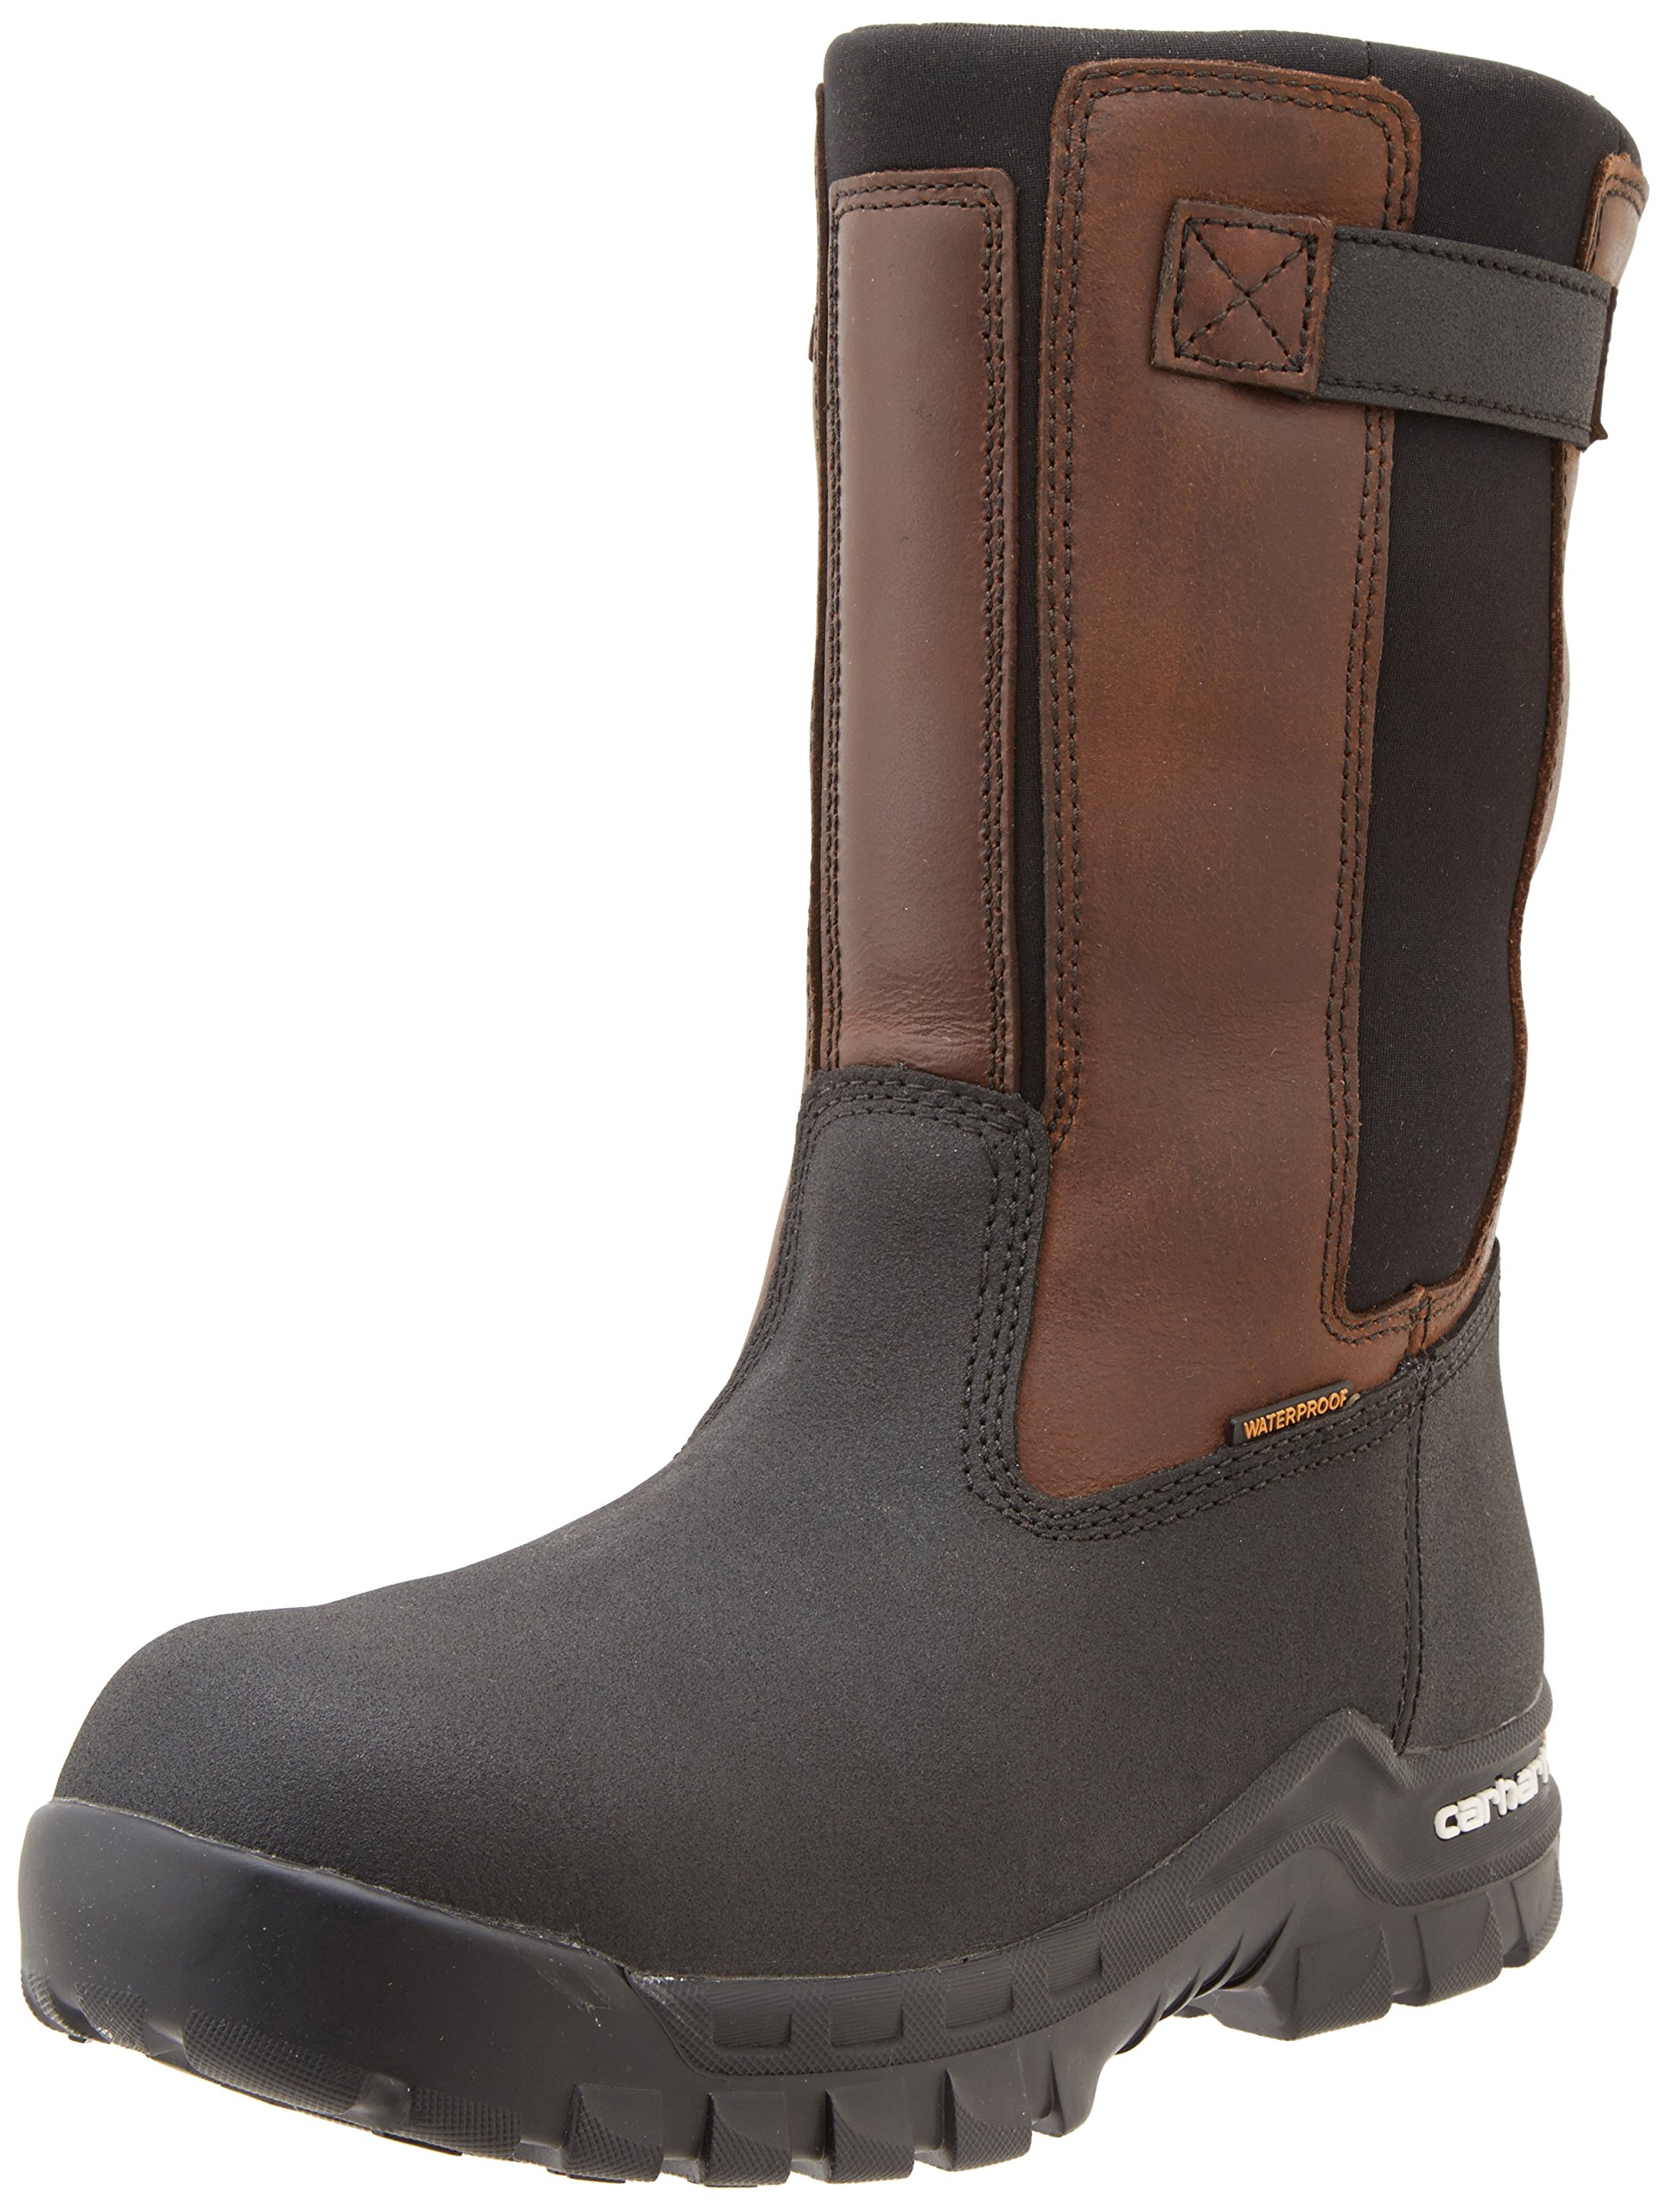 Carhartt Men's 10'' Wellington Waterproof Leather Pull On Boot CMF1391, Brown Oil Tan/Black Coated, 10 W US